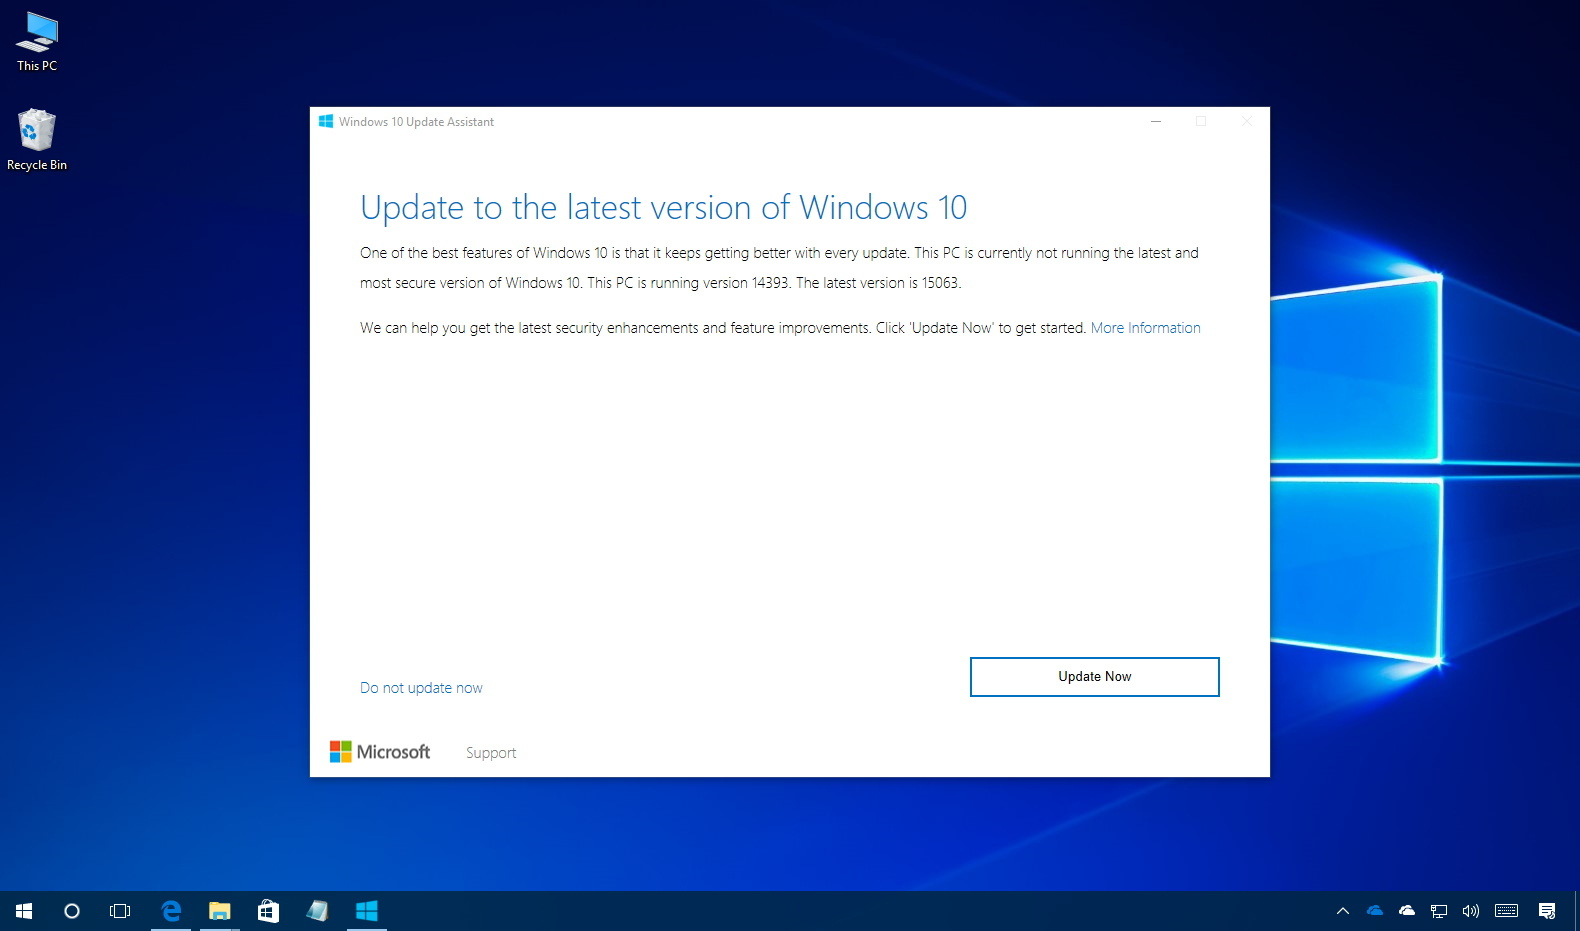 Windows 10 Creators Update using Update Assistant